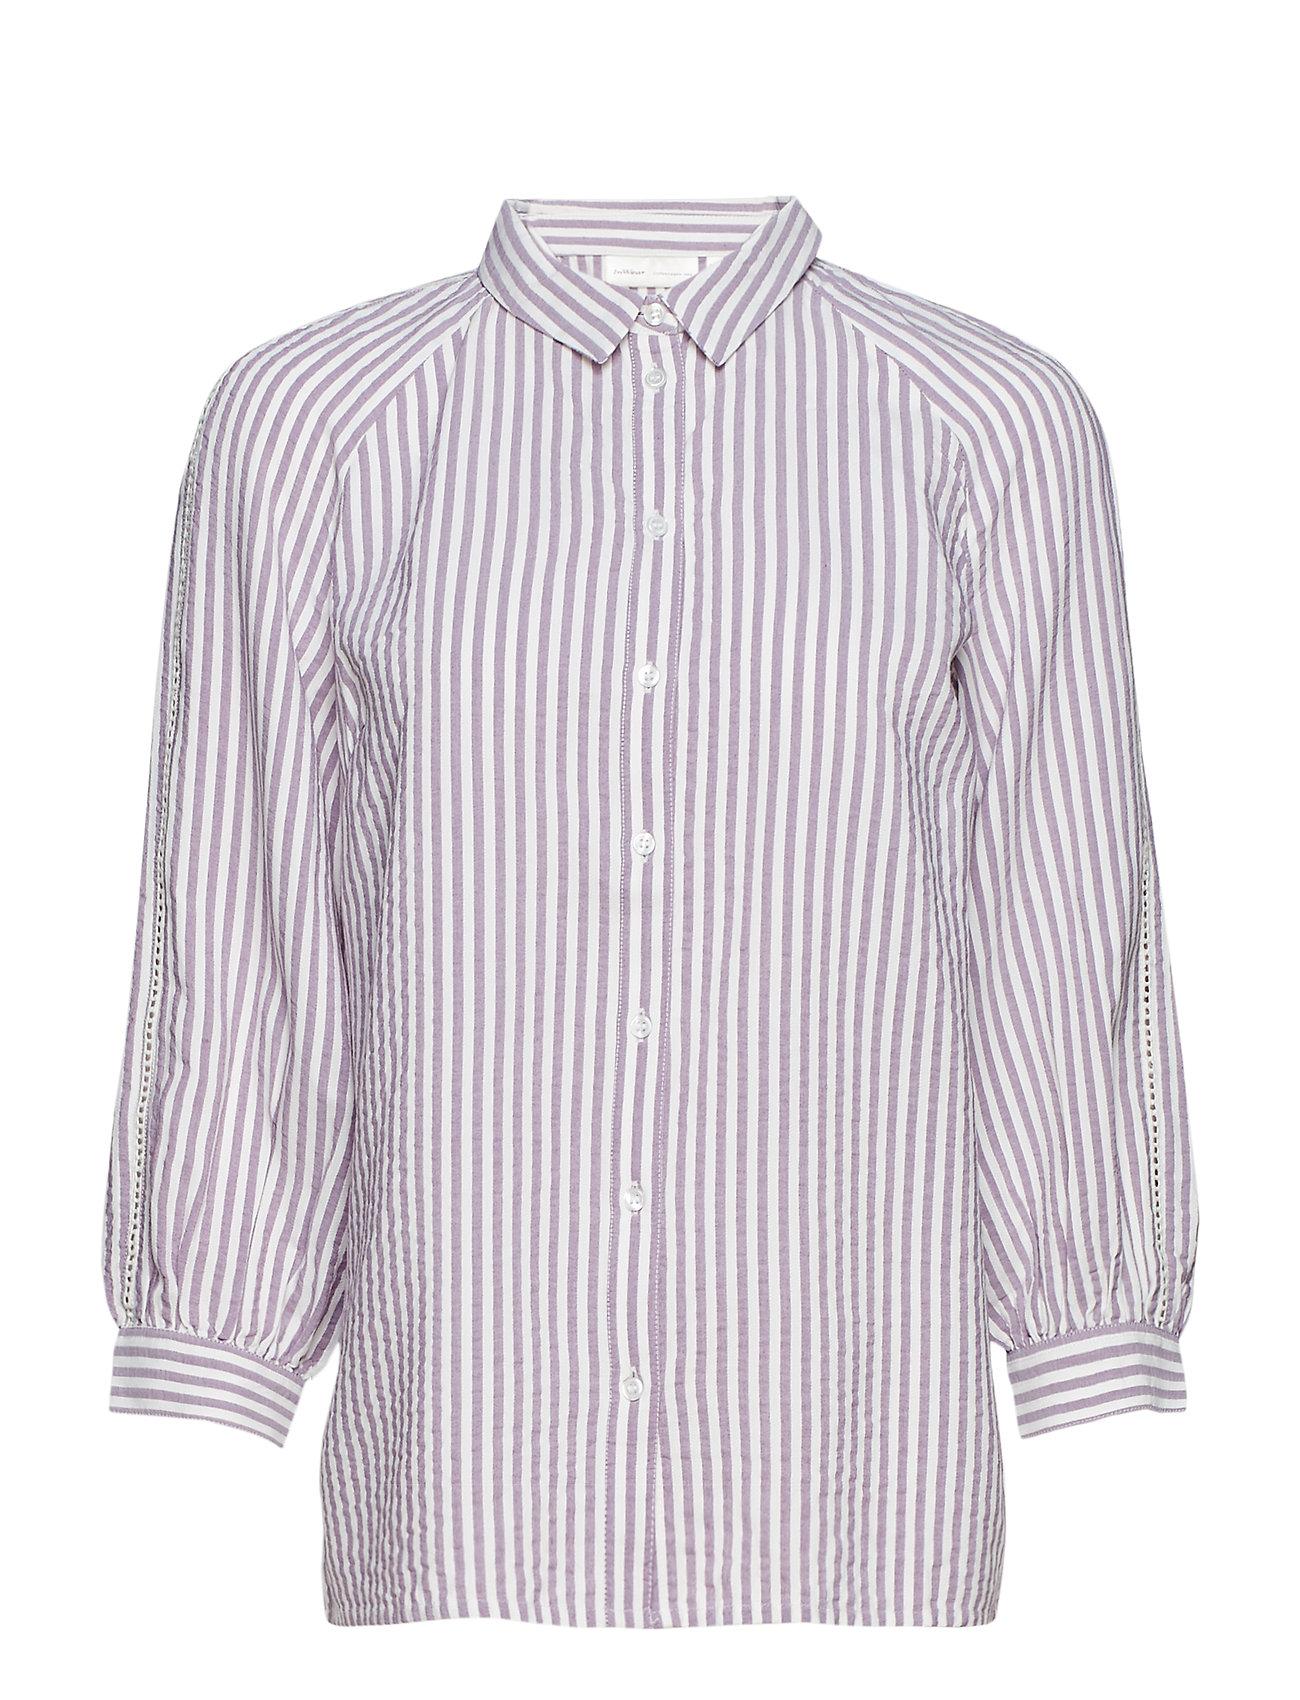 Image of Alma Striped Shirt (3090826387)